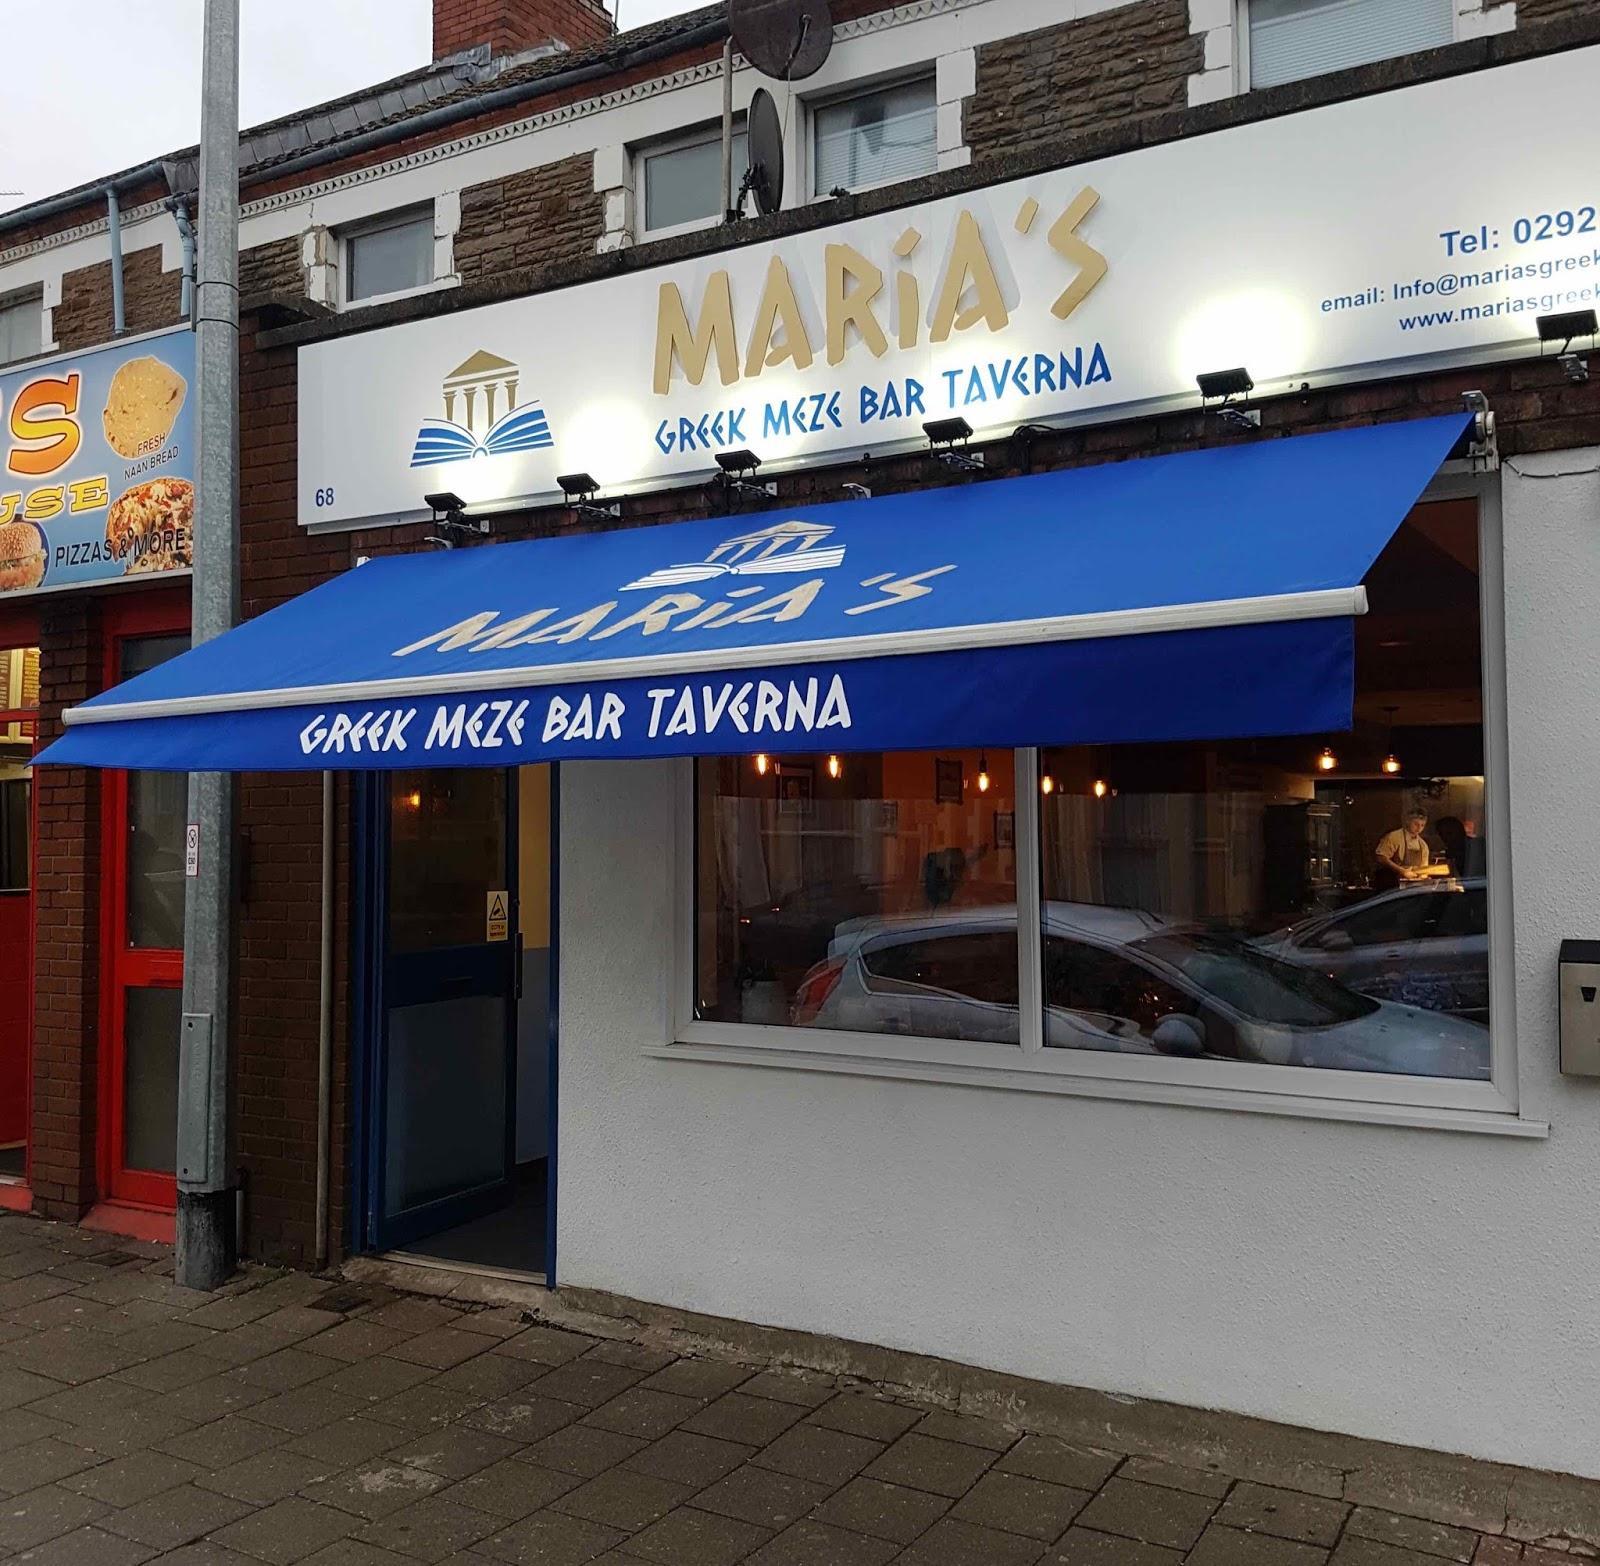 Kitchen Bar Thessaloniki: GourmetGorro: Maria's Greek Meze Bar Taverna, Cardiff